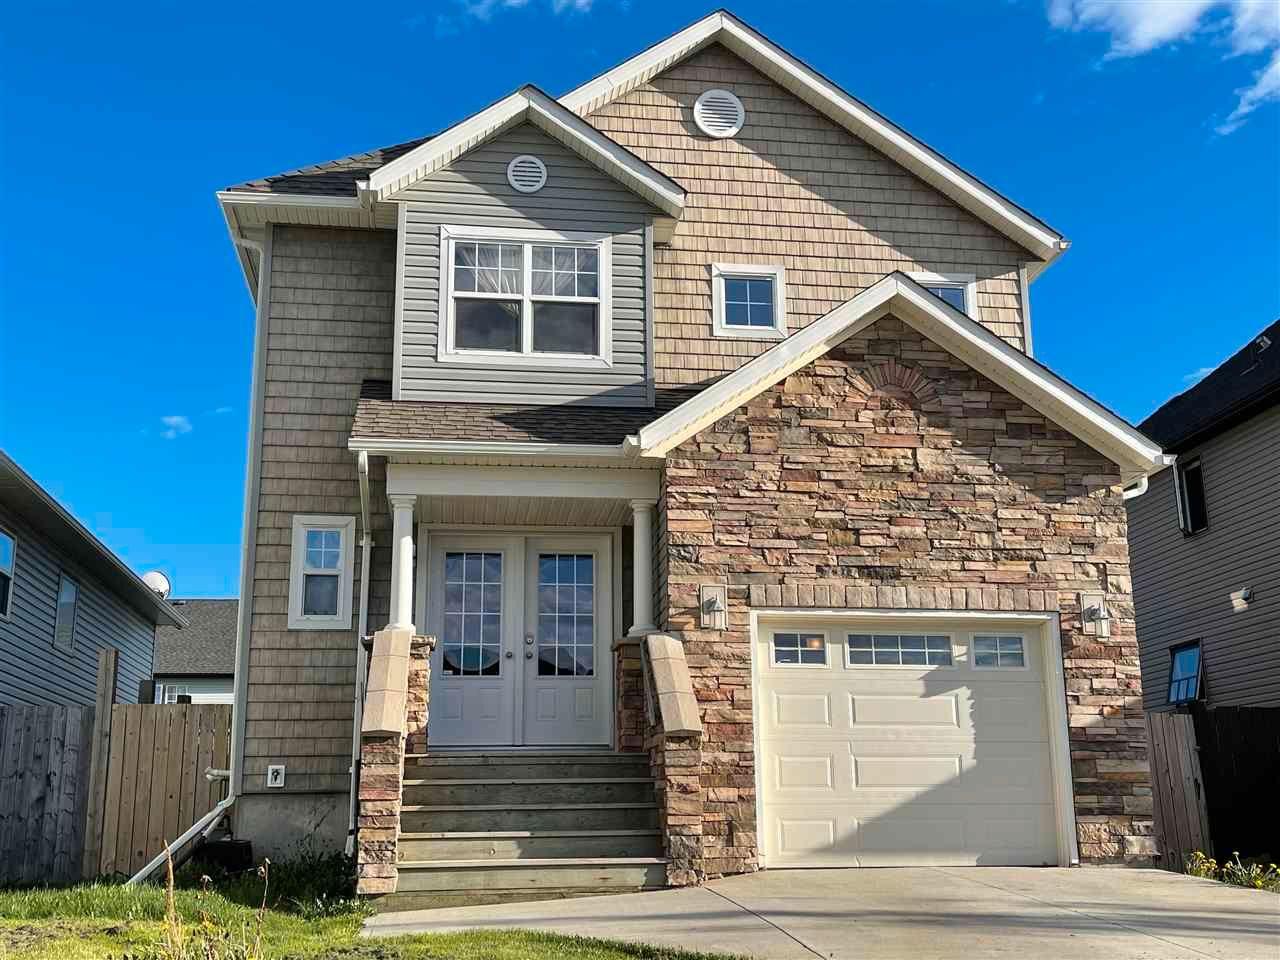 "Main Photo: 8619 113A Avenue in Fort St. John: Fort St. John - City NE House for sale in ""PANORAMA RIDGE"" (Fort St. John (Zone 60))  : MLS®# R2560781"